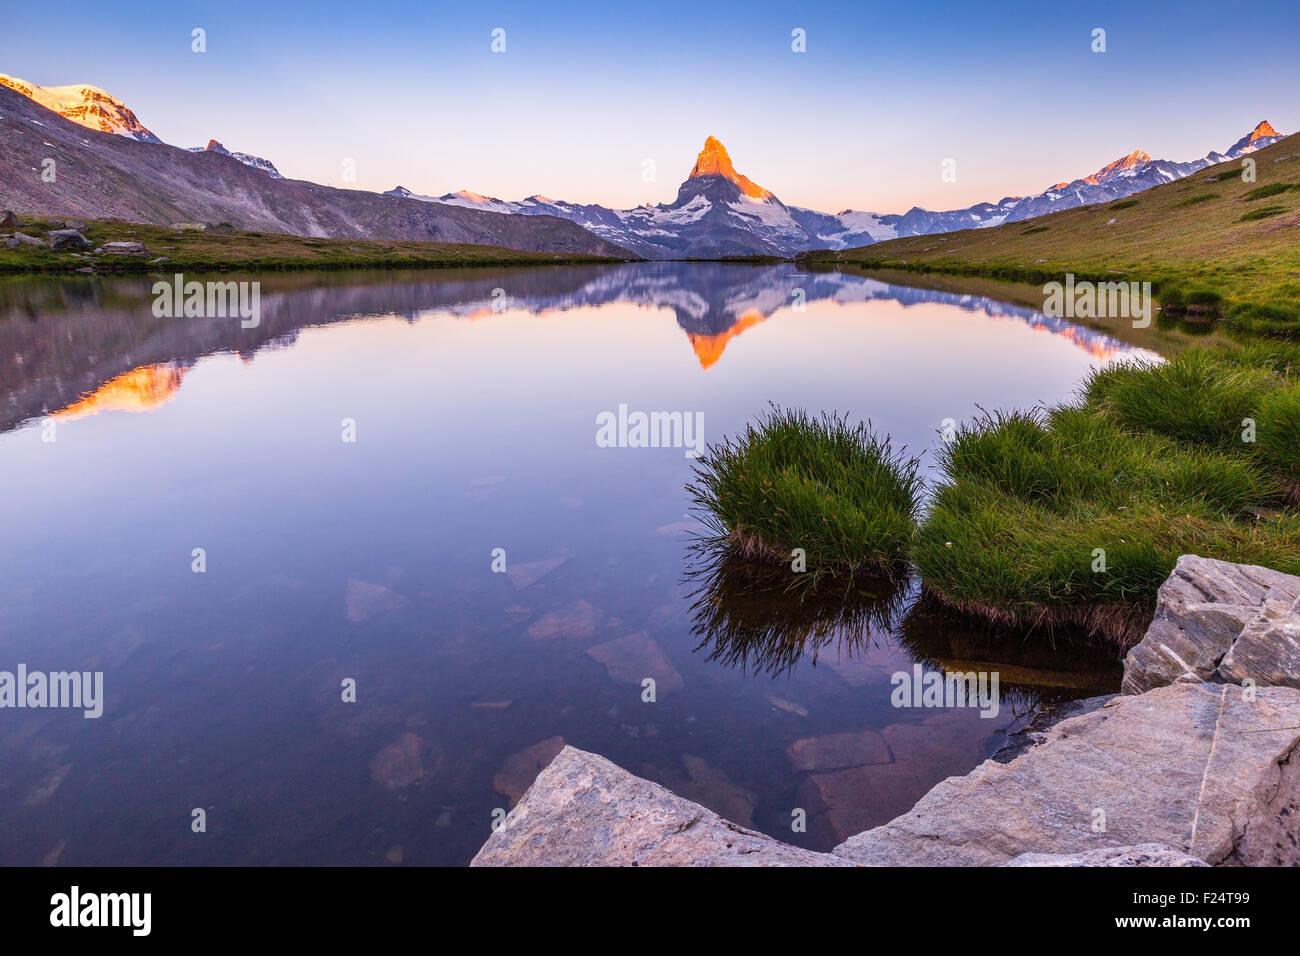 Sunrise on Matterhorn (Cervino) mountain peak. View from Lake Stellisee, Alpine landscape, Zermatt, Swiss Alps. Stock Photo